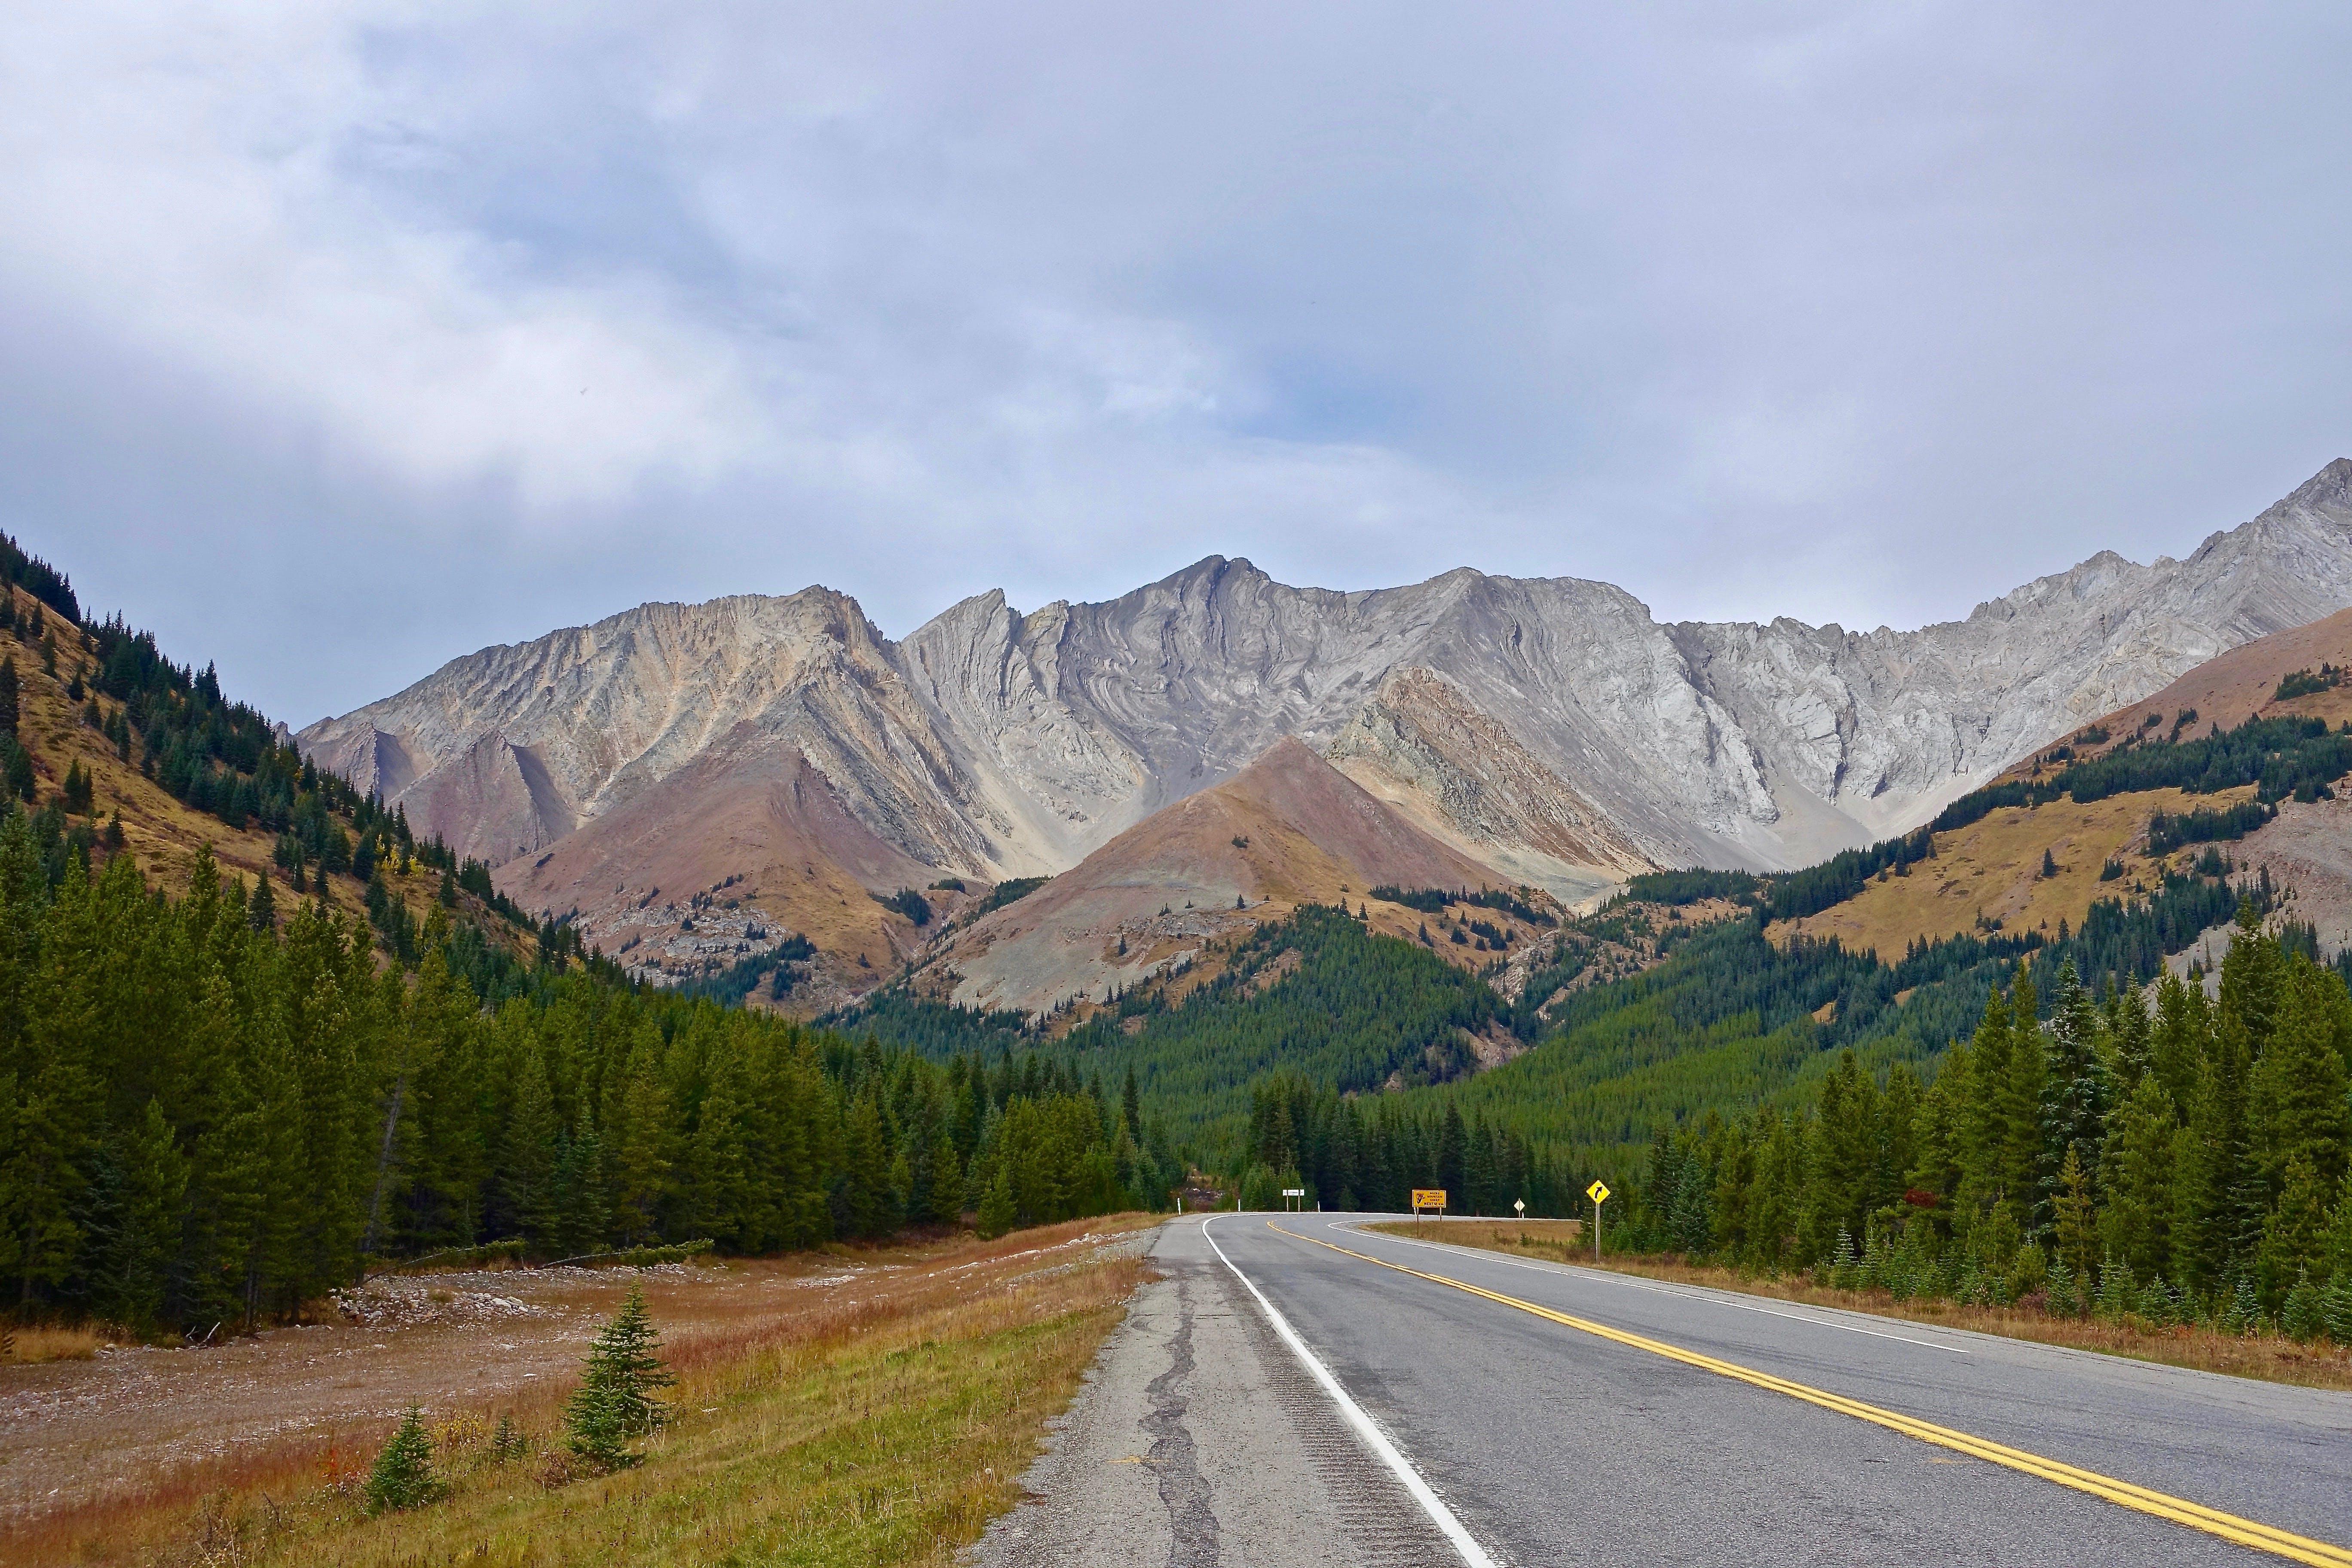 Kostenloses Stock Foto zu autobahn, berg, felsiger berg, landschaft